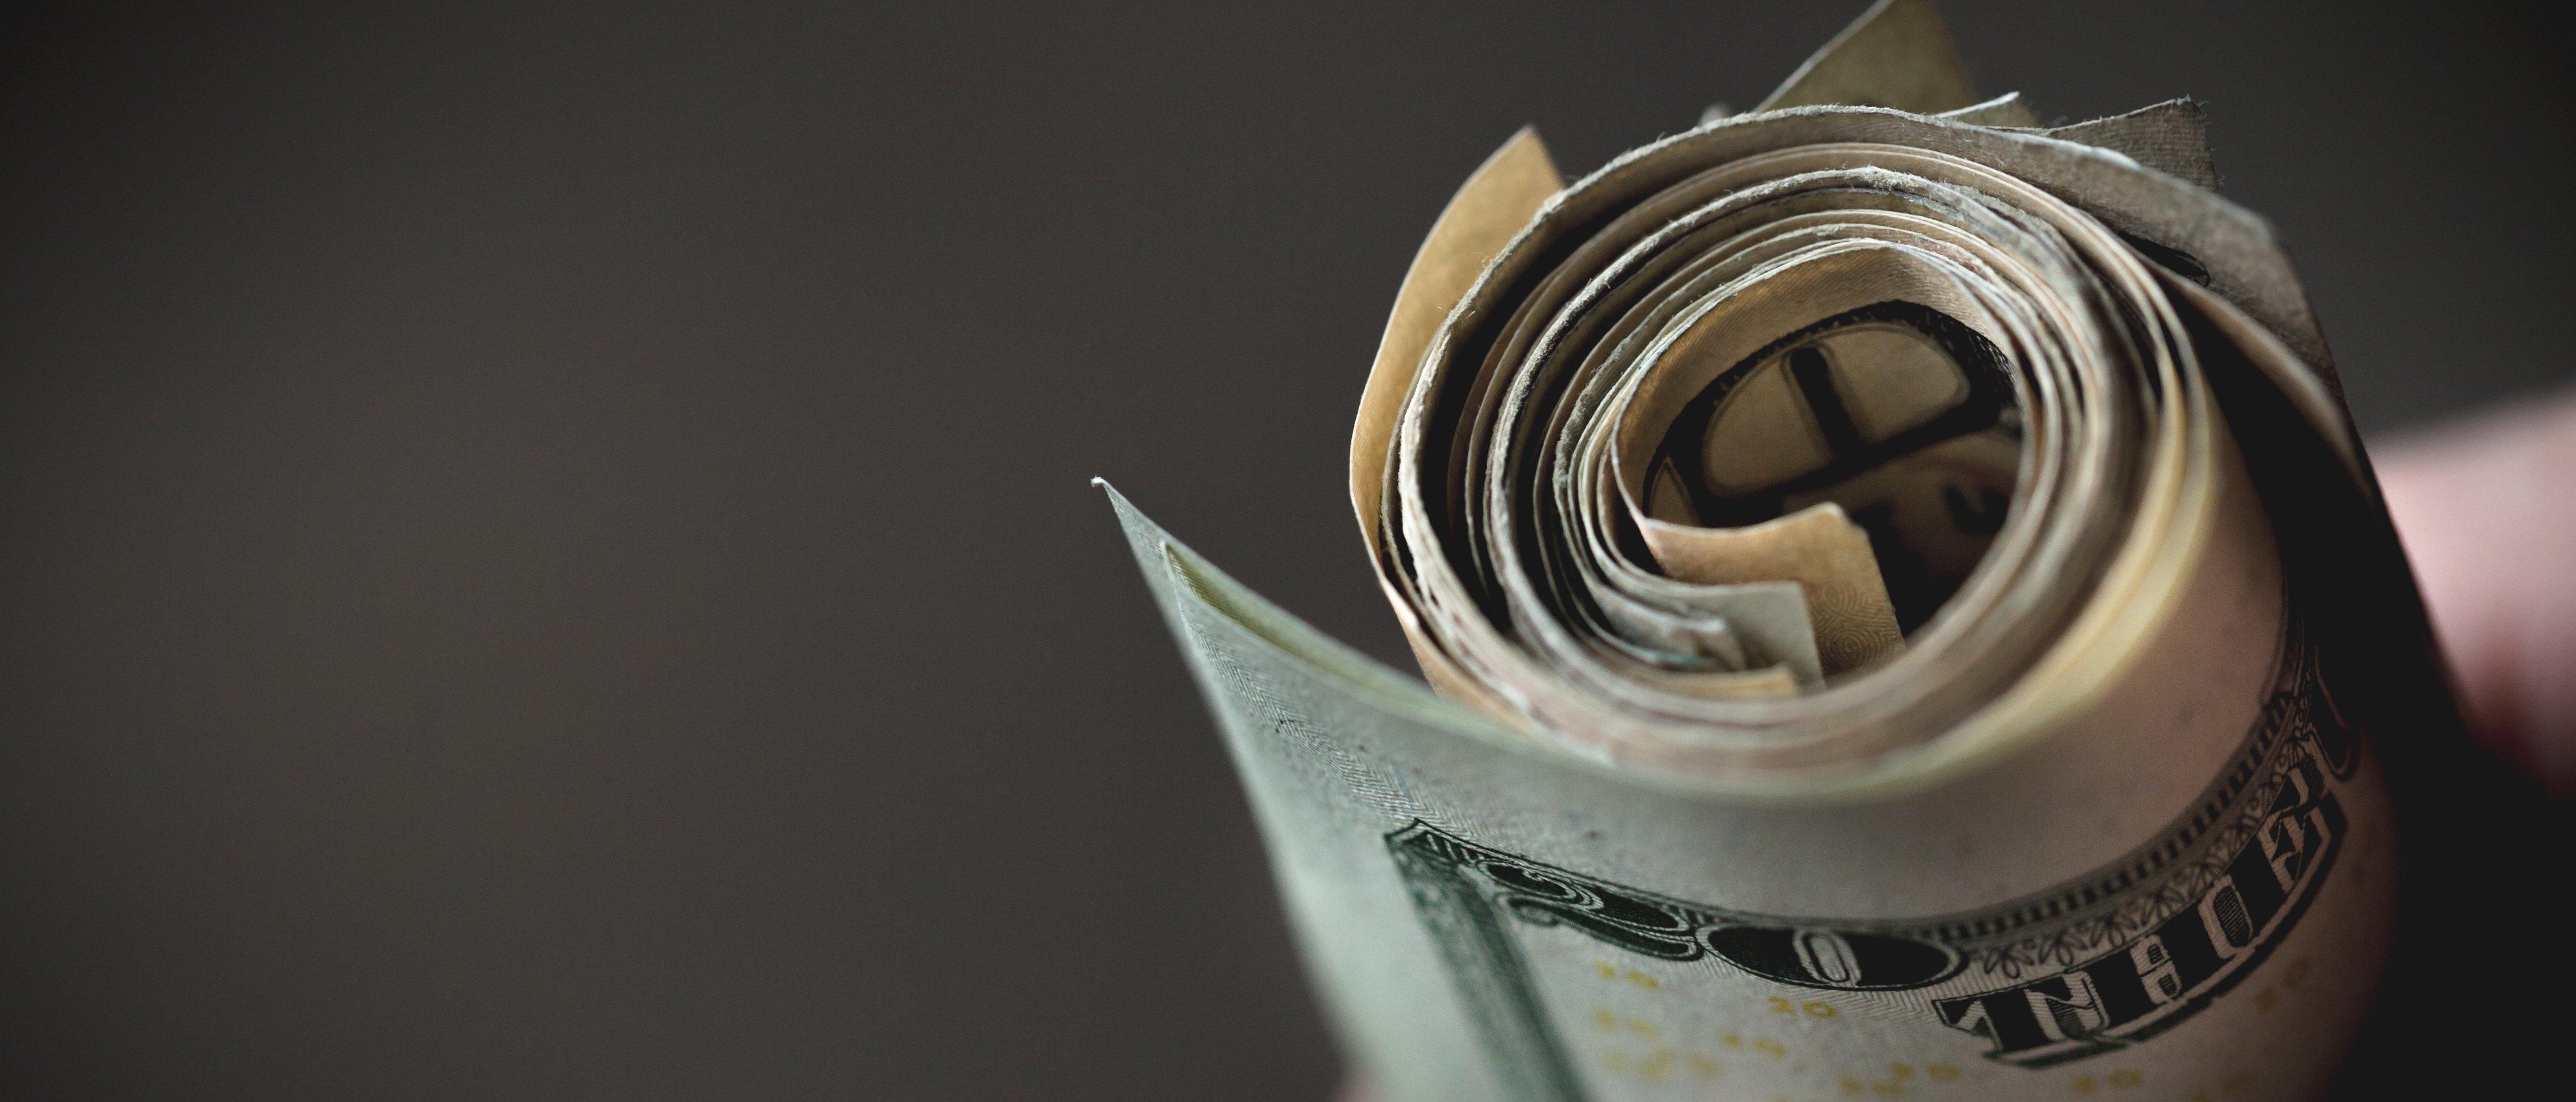 money-rolled_4460x4460.jpg